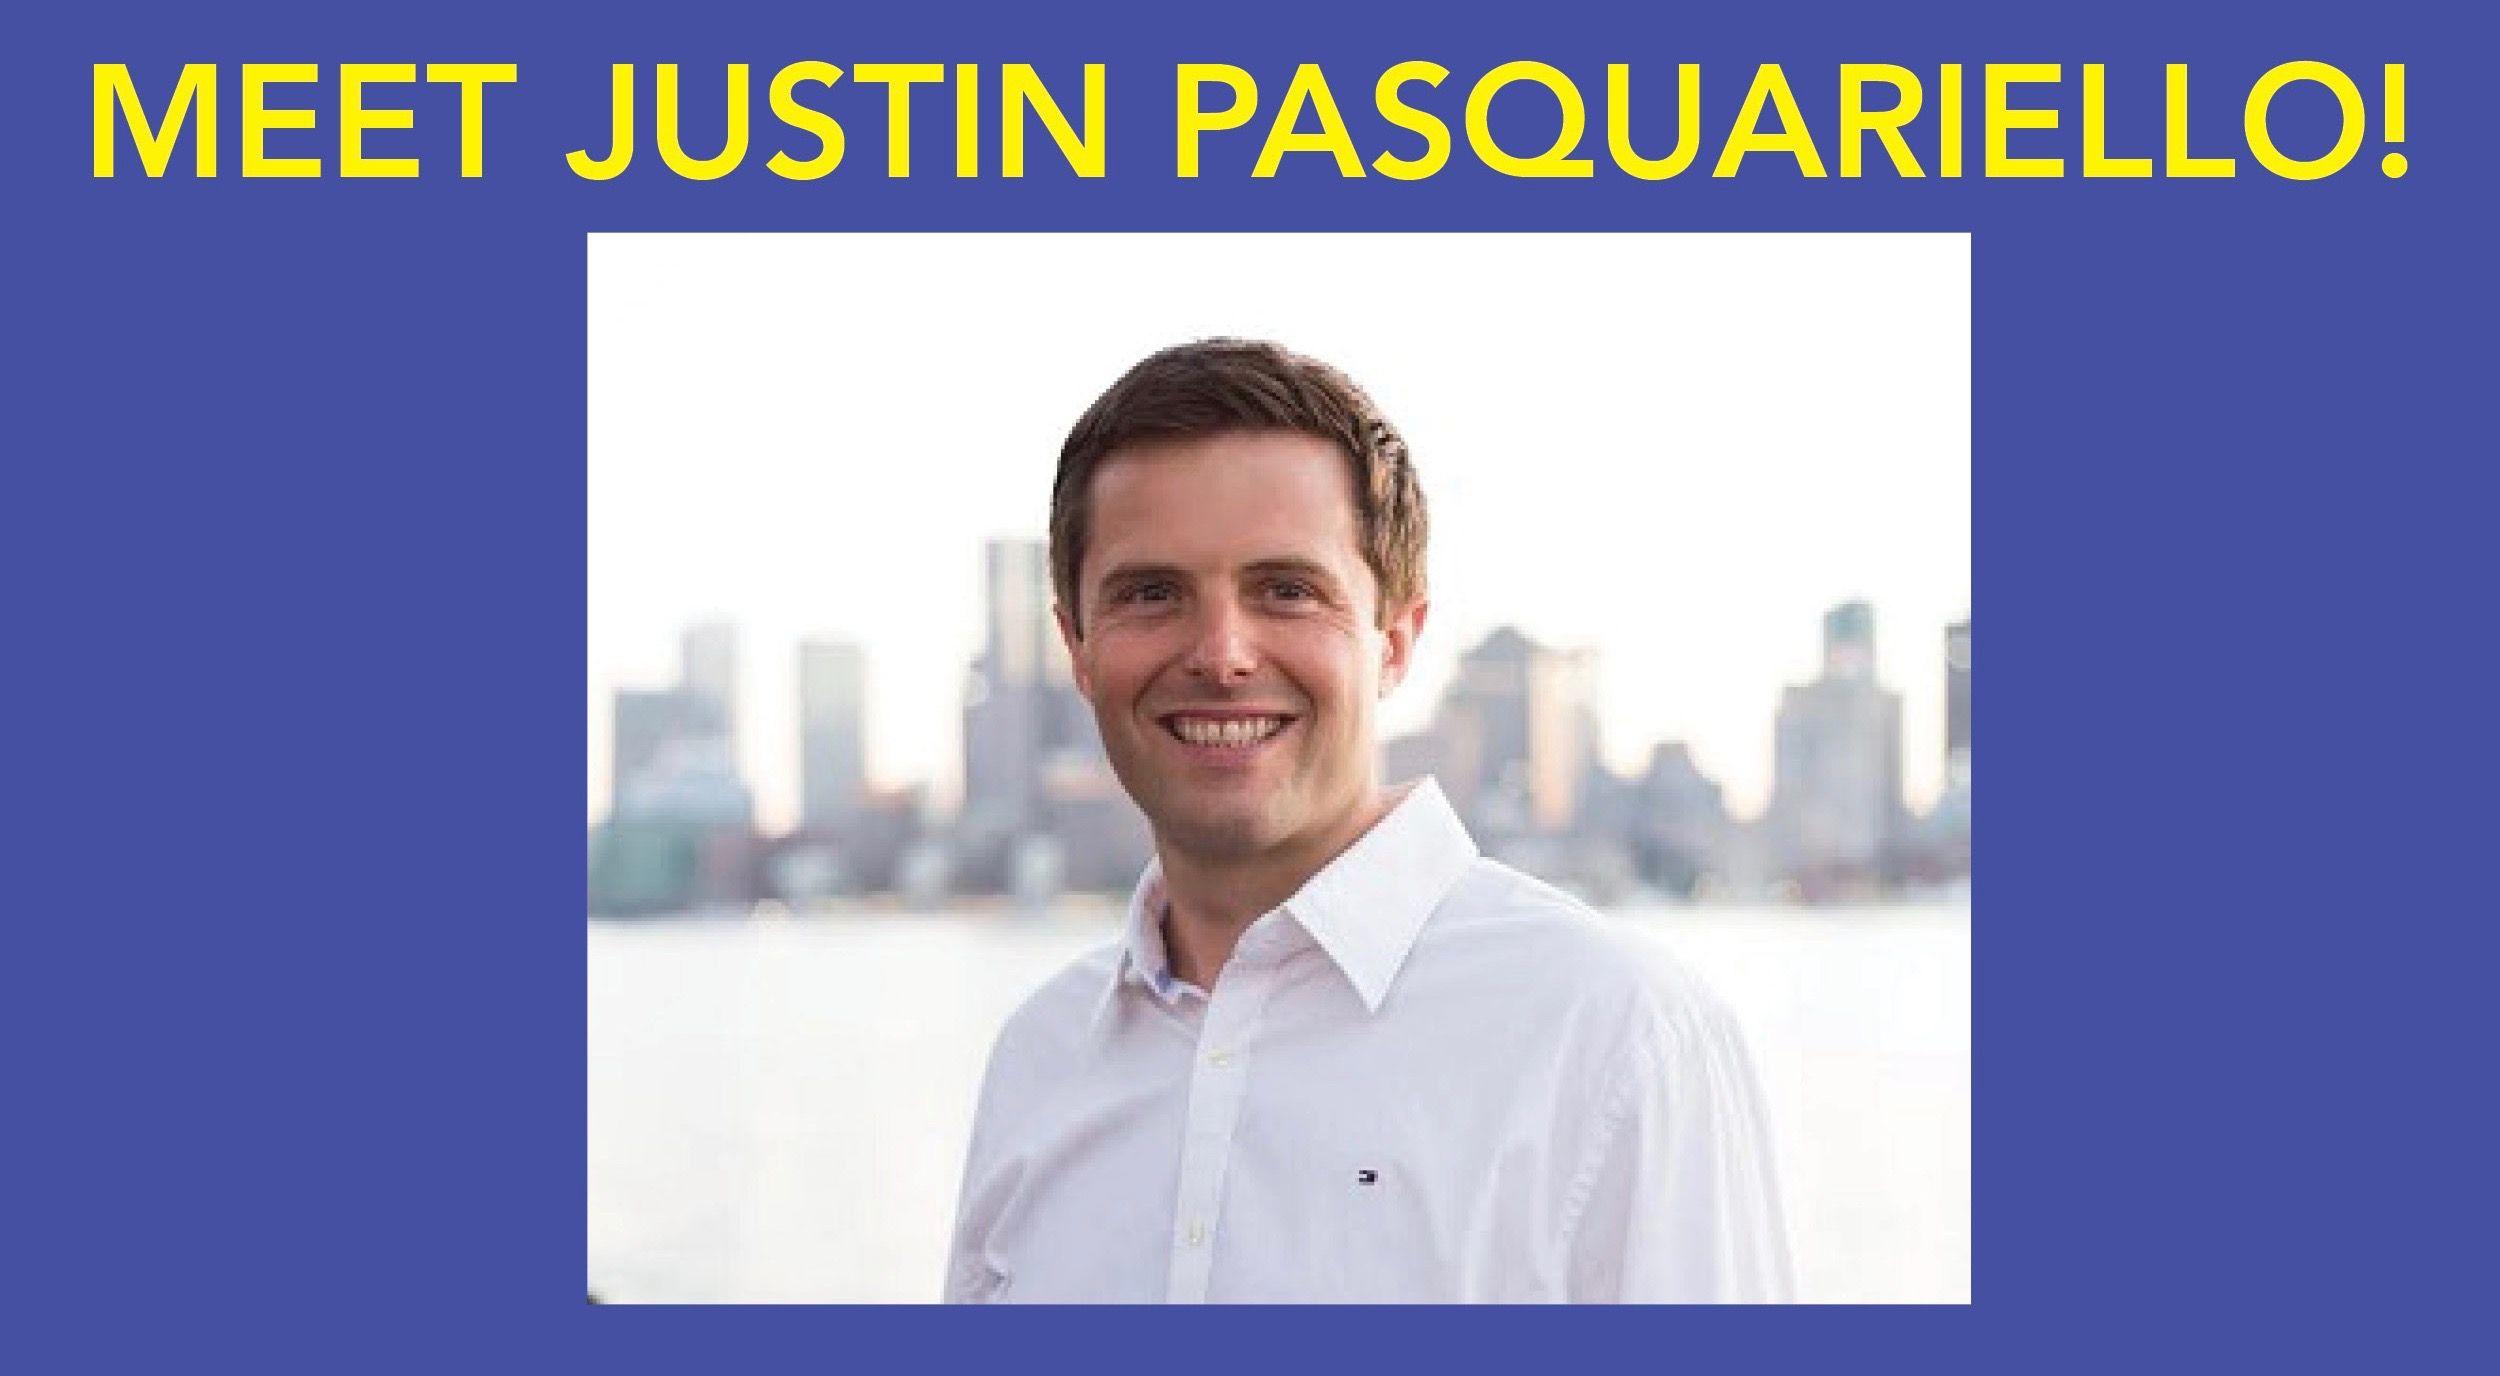 Meet Justin Pasquariello